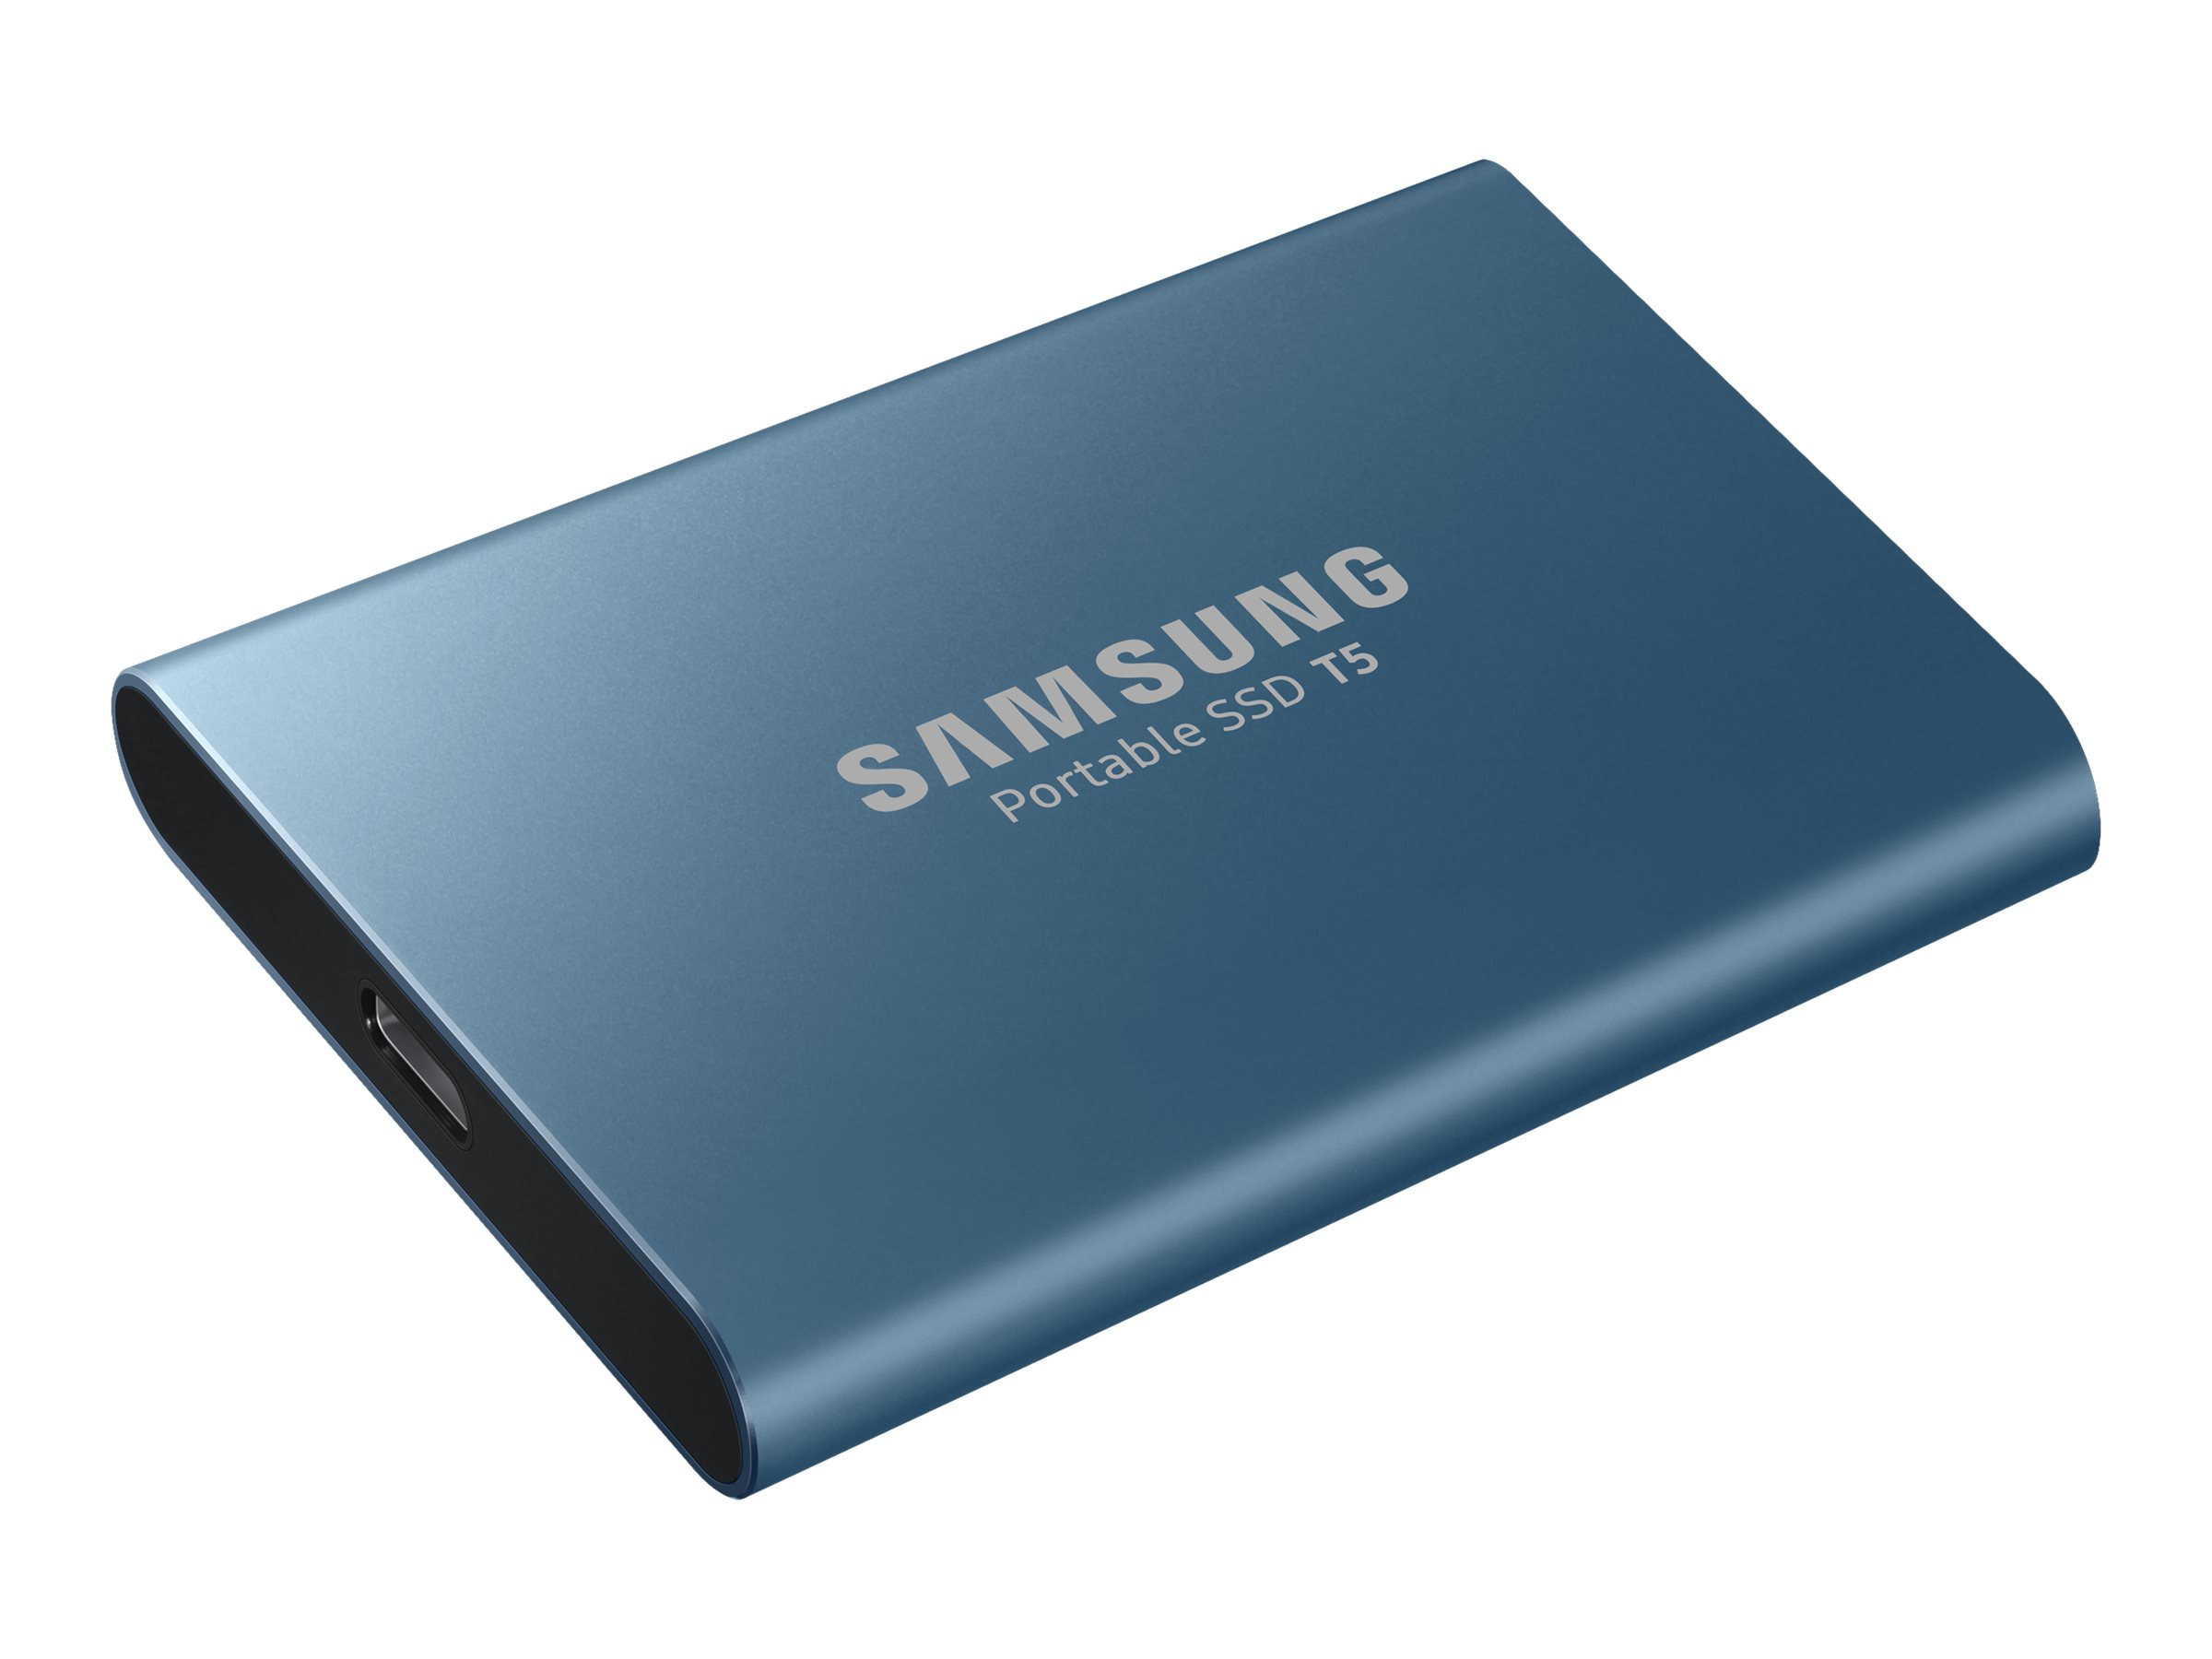 Samsung T5 MU-PA500 - Solid-State-Disk - verschlüsselt - 500 GB - extern (tragbar) - USB 3.1 Gen 2 (USB-C Steckverbinder)